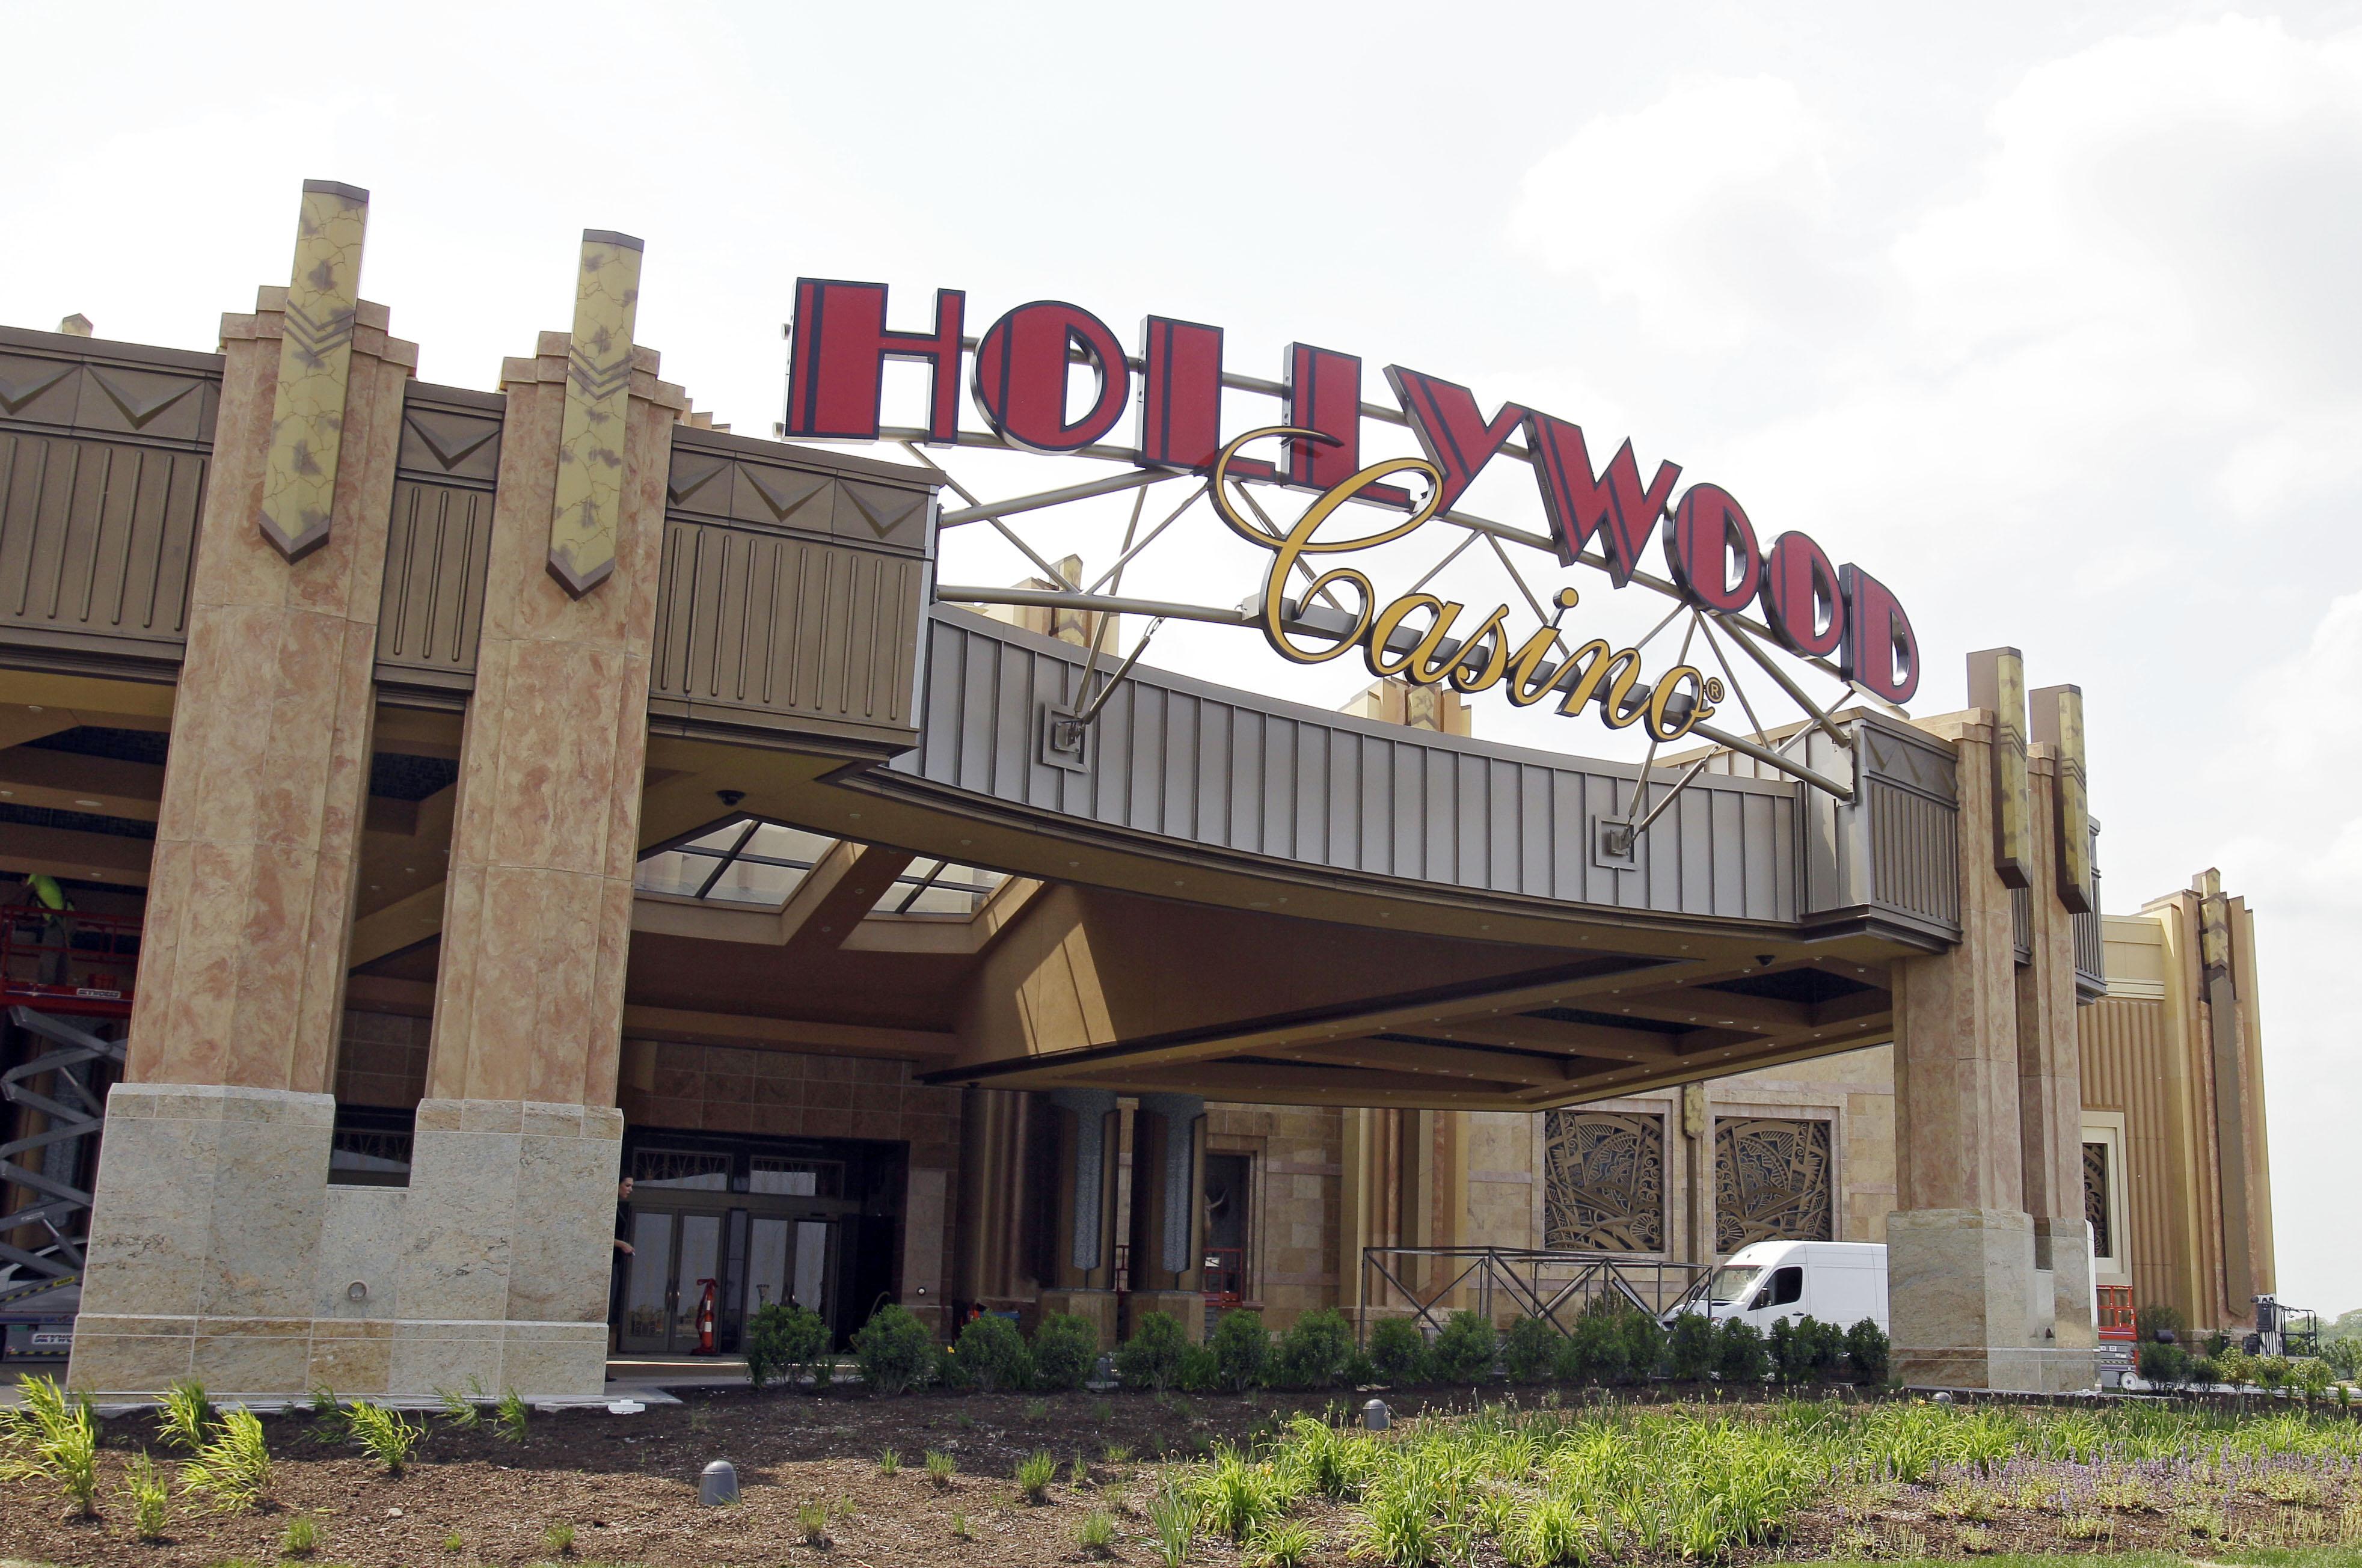 Ohio+hotel+casinos praire knights casino